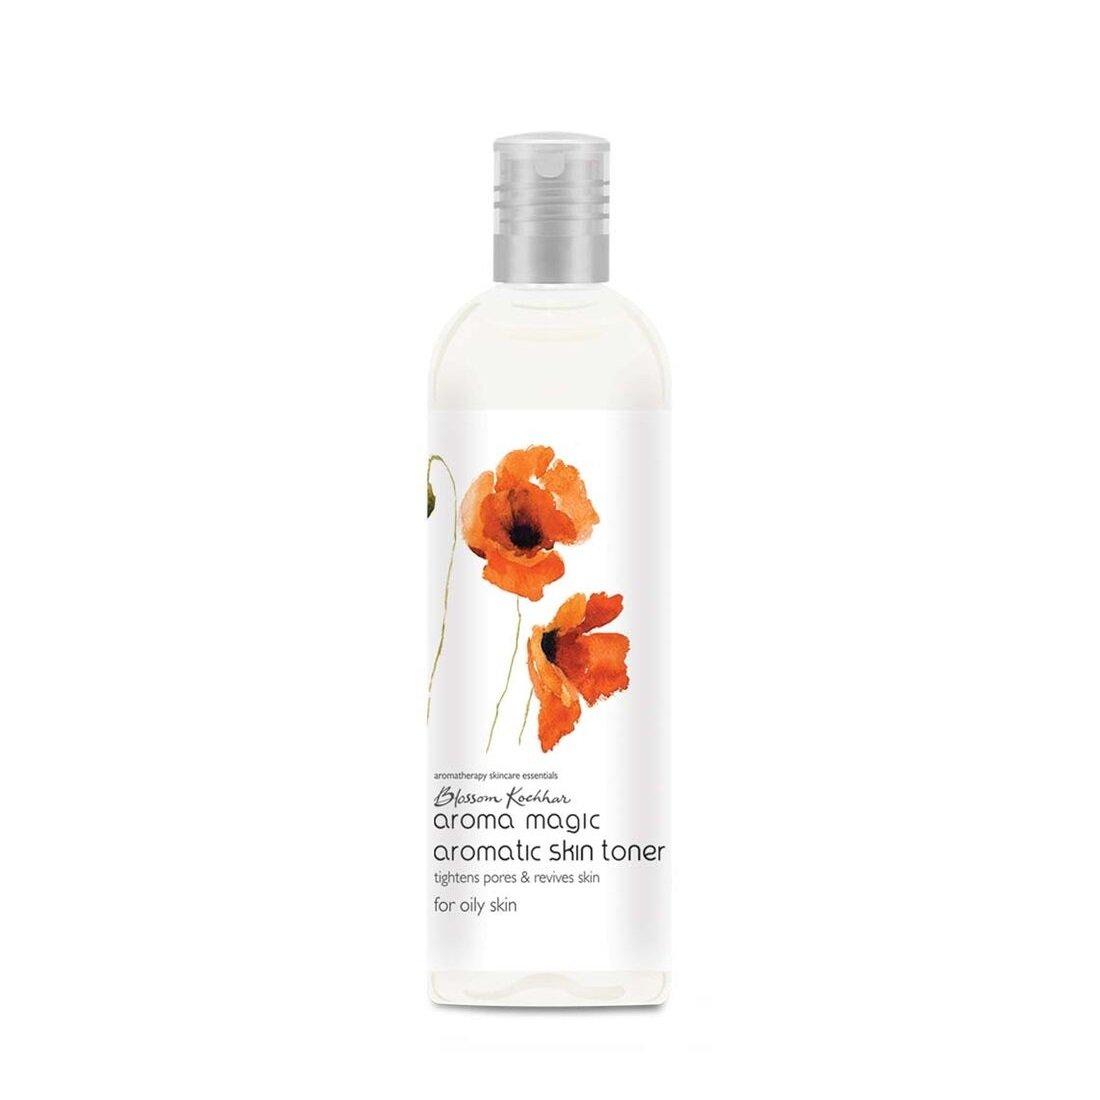 Aroma Magic Aromatic Skin Toner